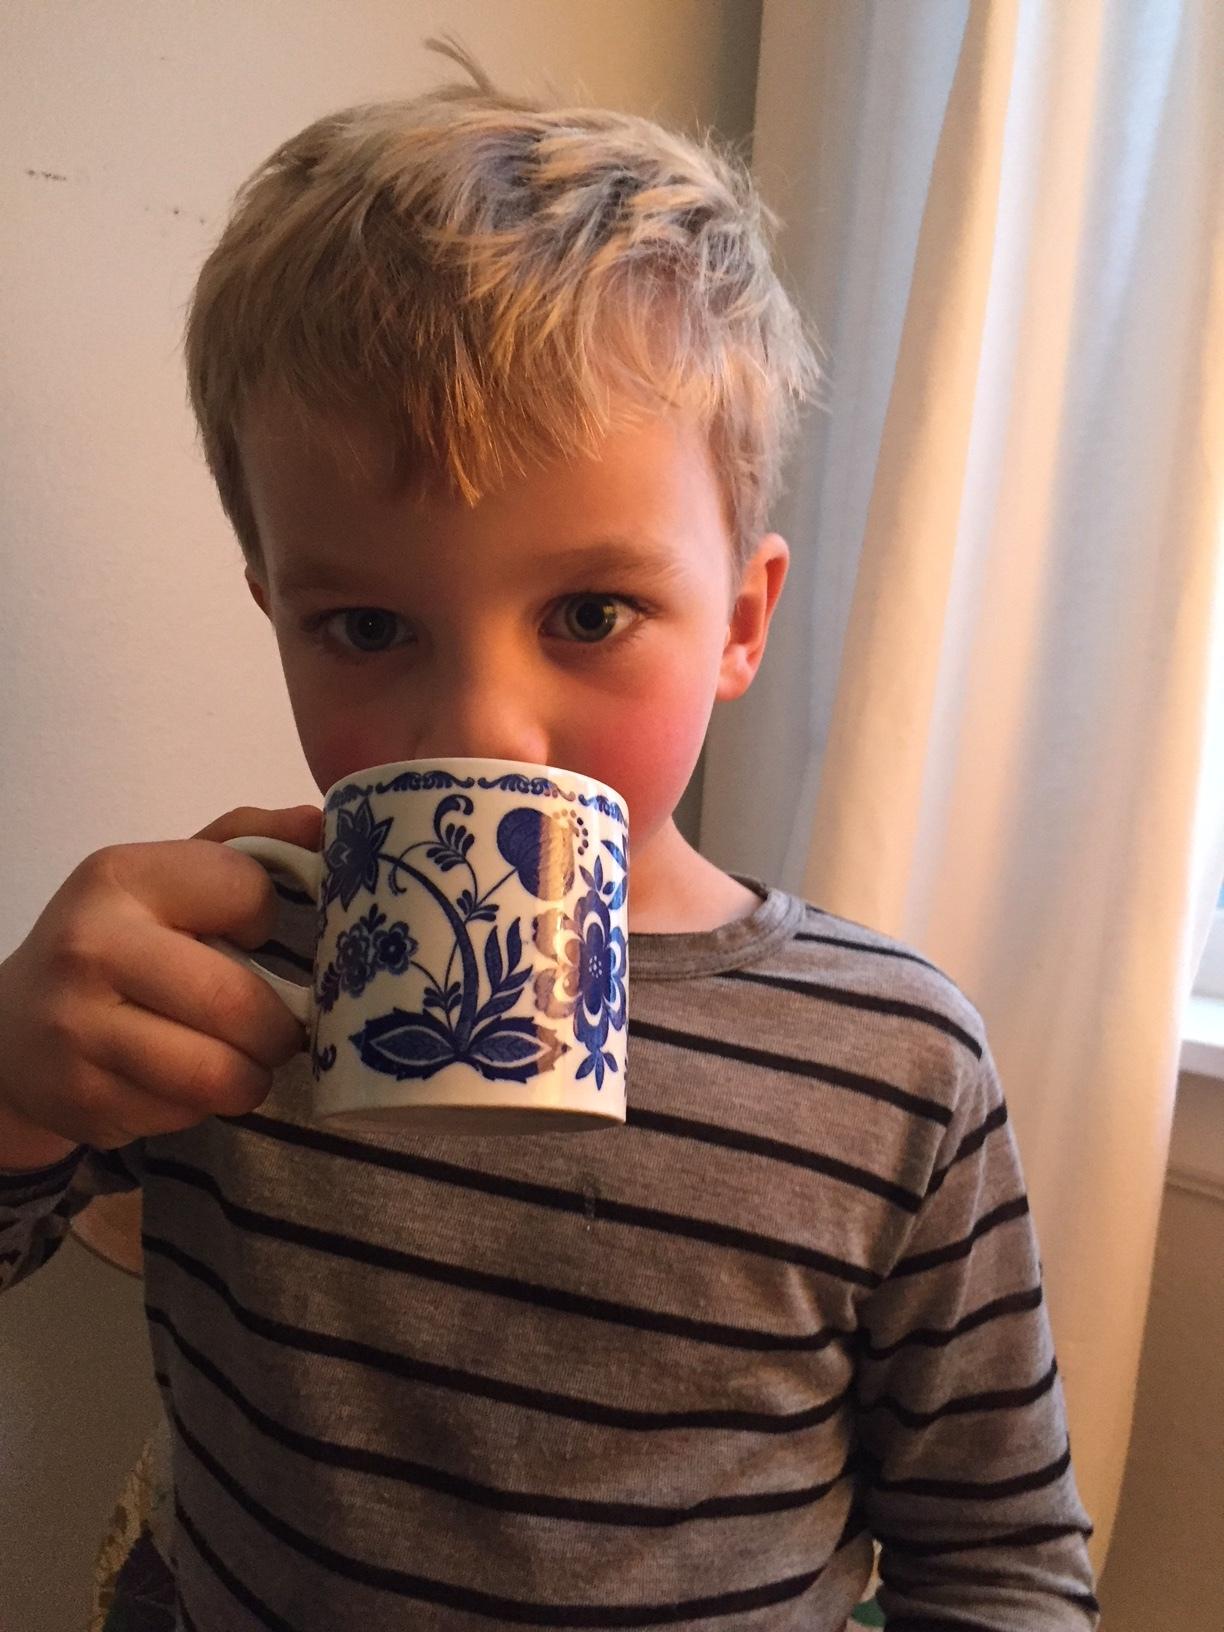 Treats for coffe or tea